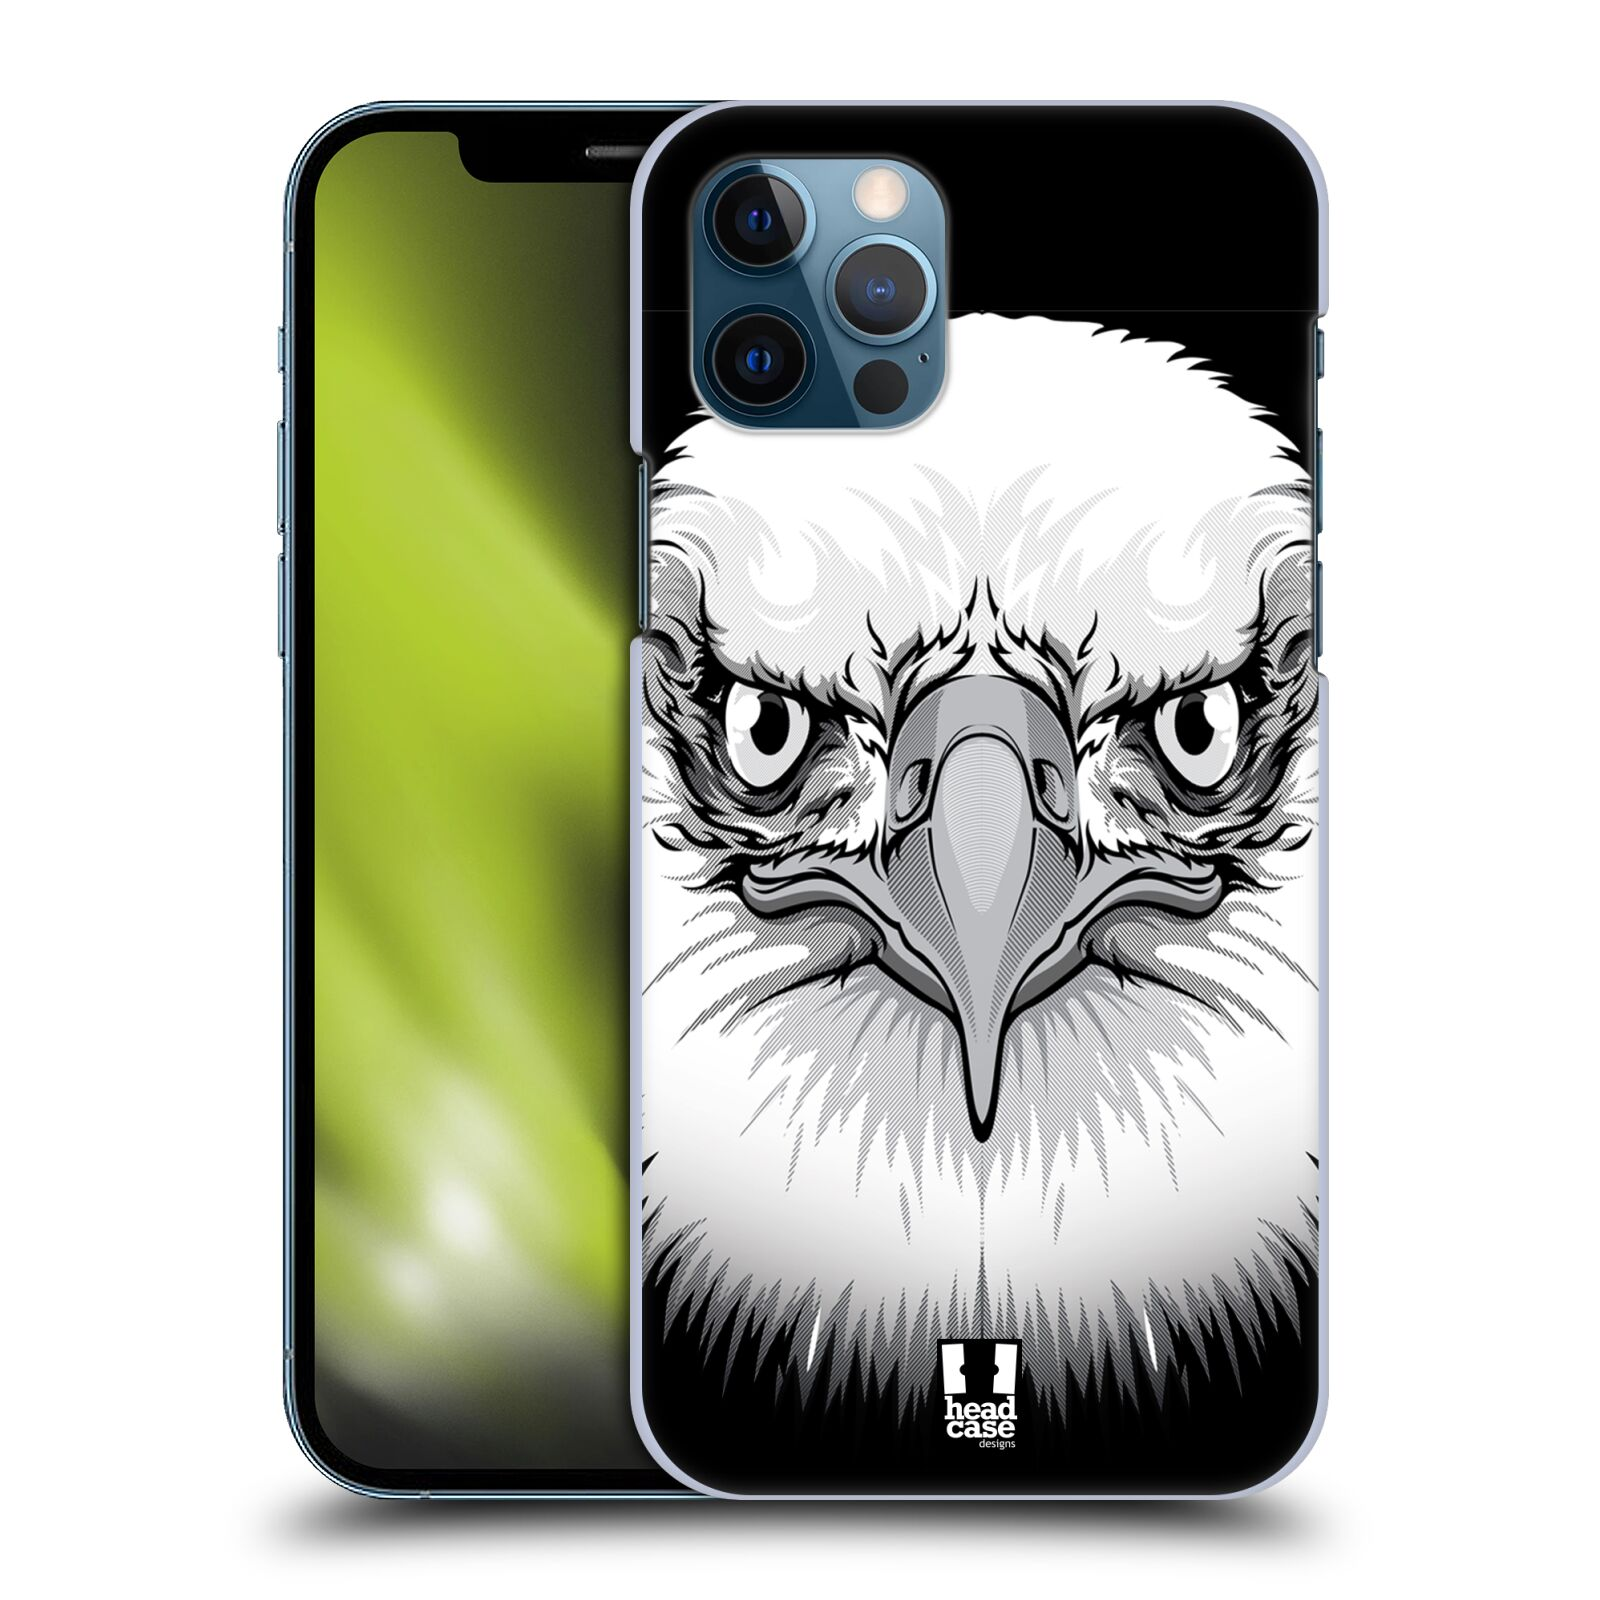 Plastové pouzdro na mobil Apple iPhone 12 / 12 Pro - Head Case - ILUSTROVANÝ OREL